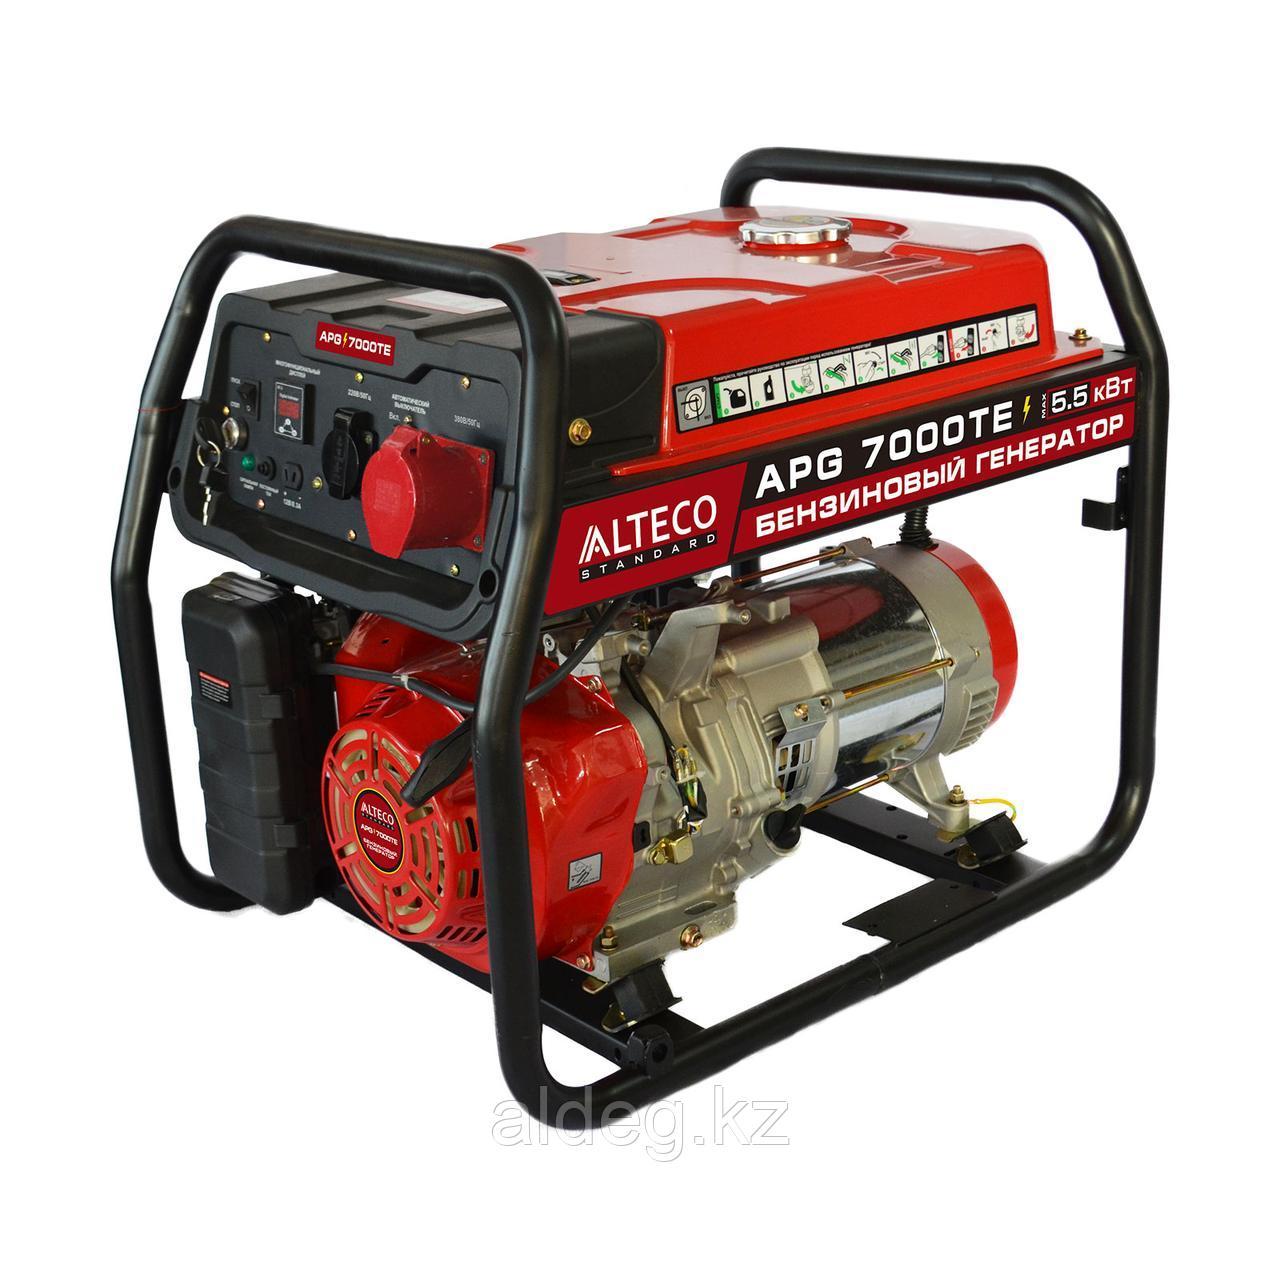 Бензиновый генератор APG 7000TE (N) ALTECO Standard